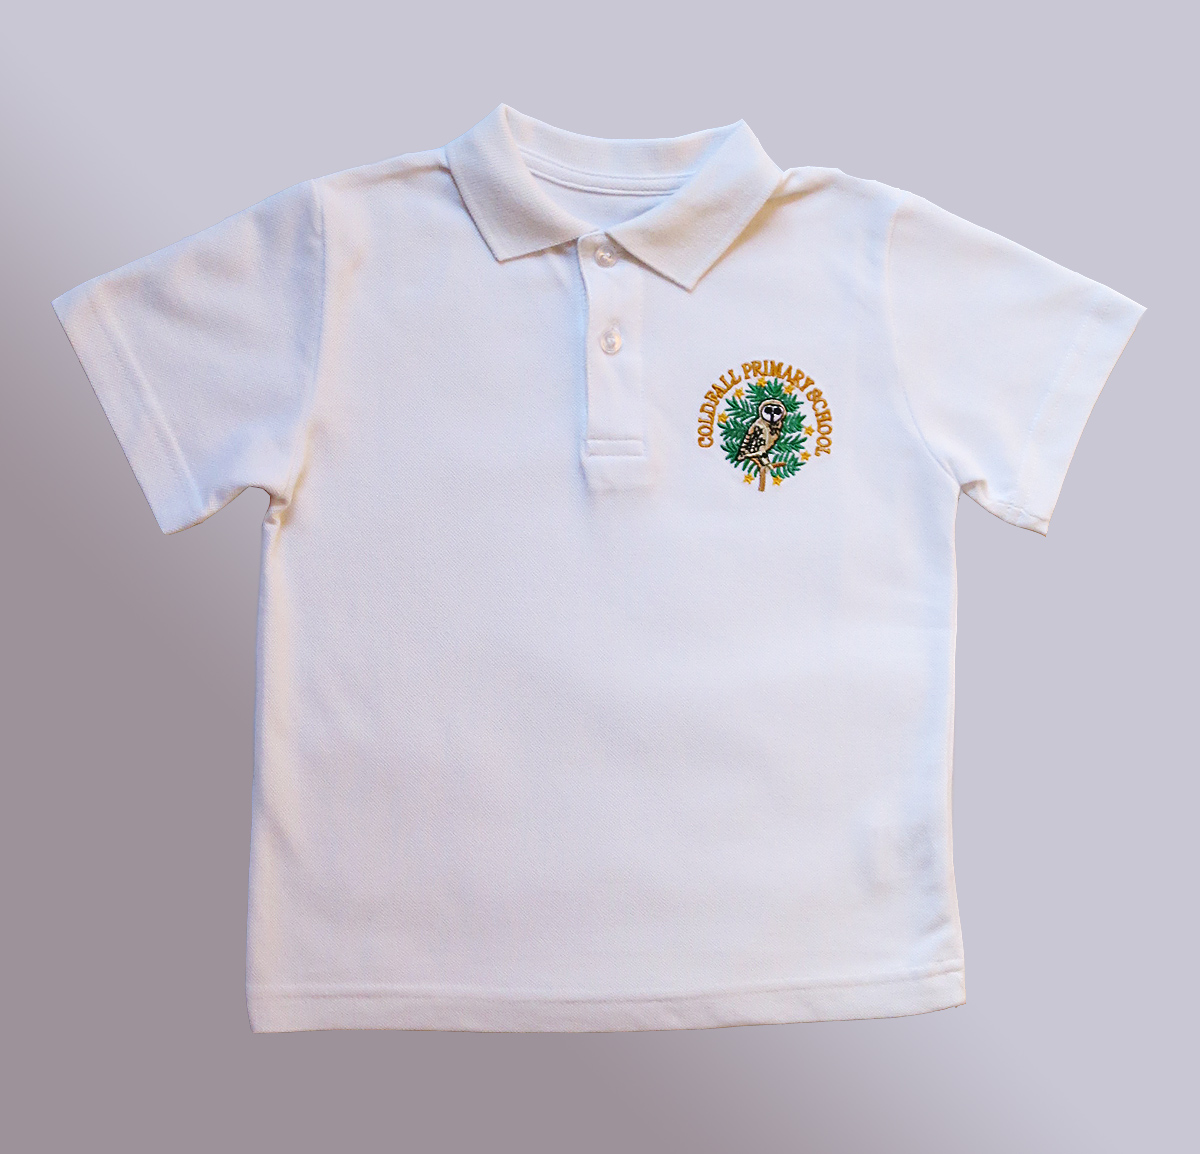 Eco friendly schoolwear organic cotton school polo shirt for Polo shirts for school